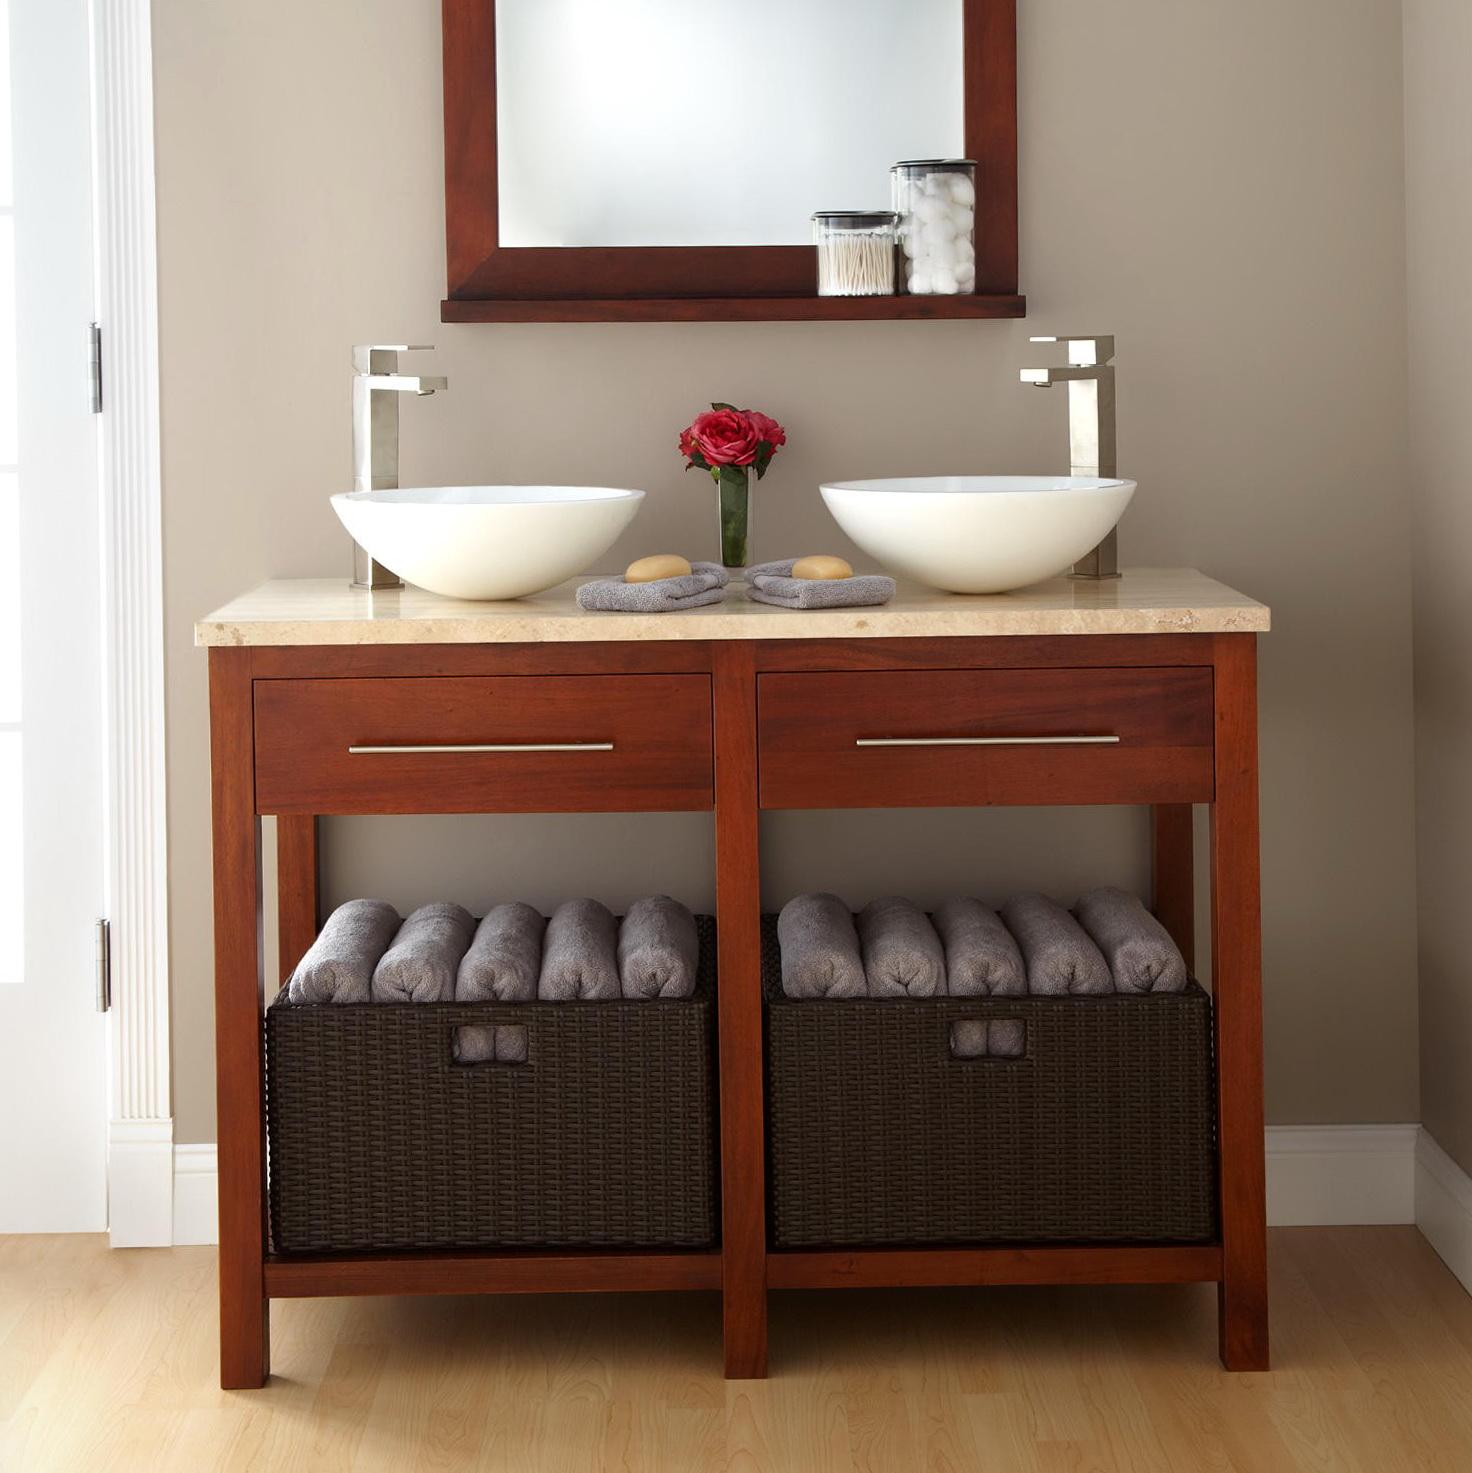 48 double sink vanity top home design ideas. Black Bedroom Furniture Sets. Home Design Ideas